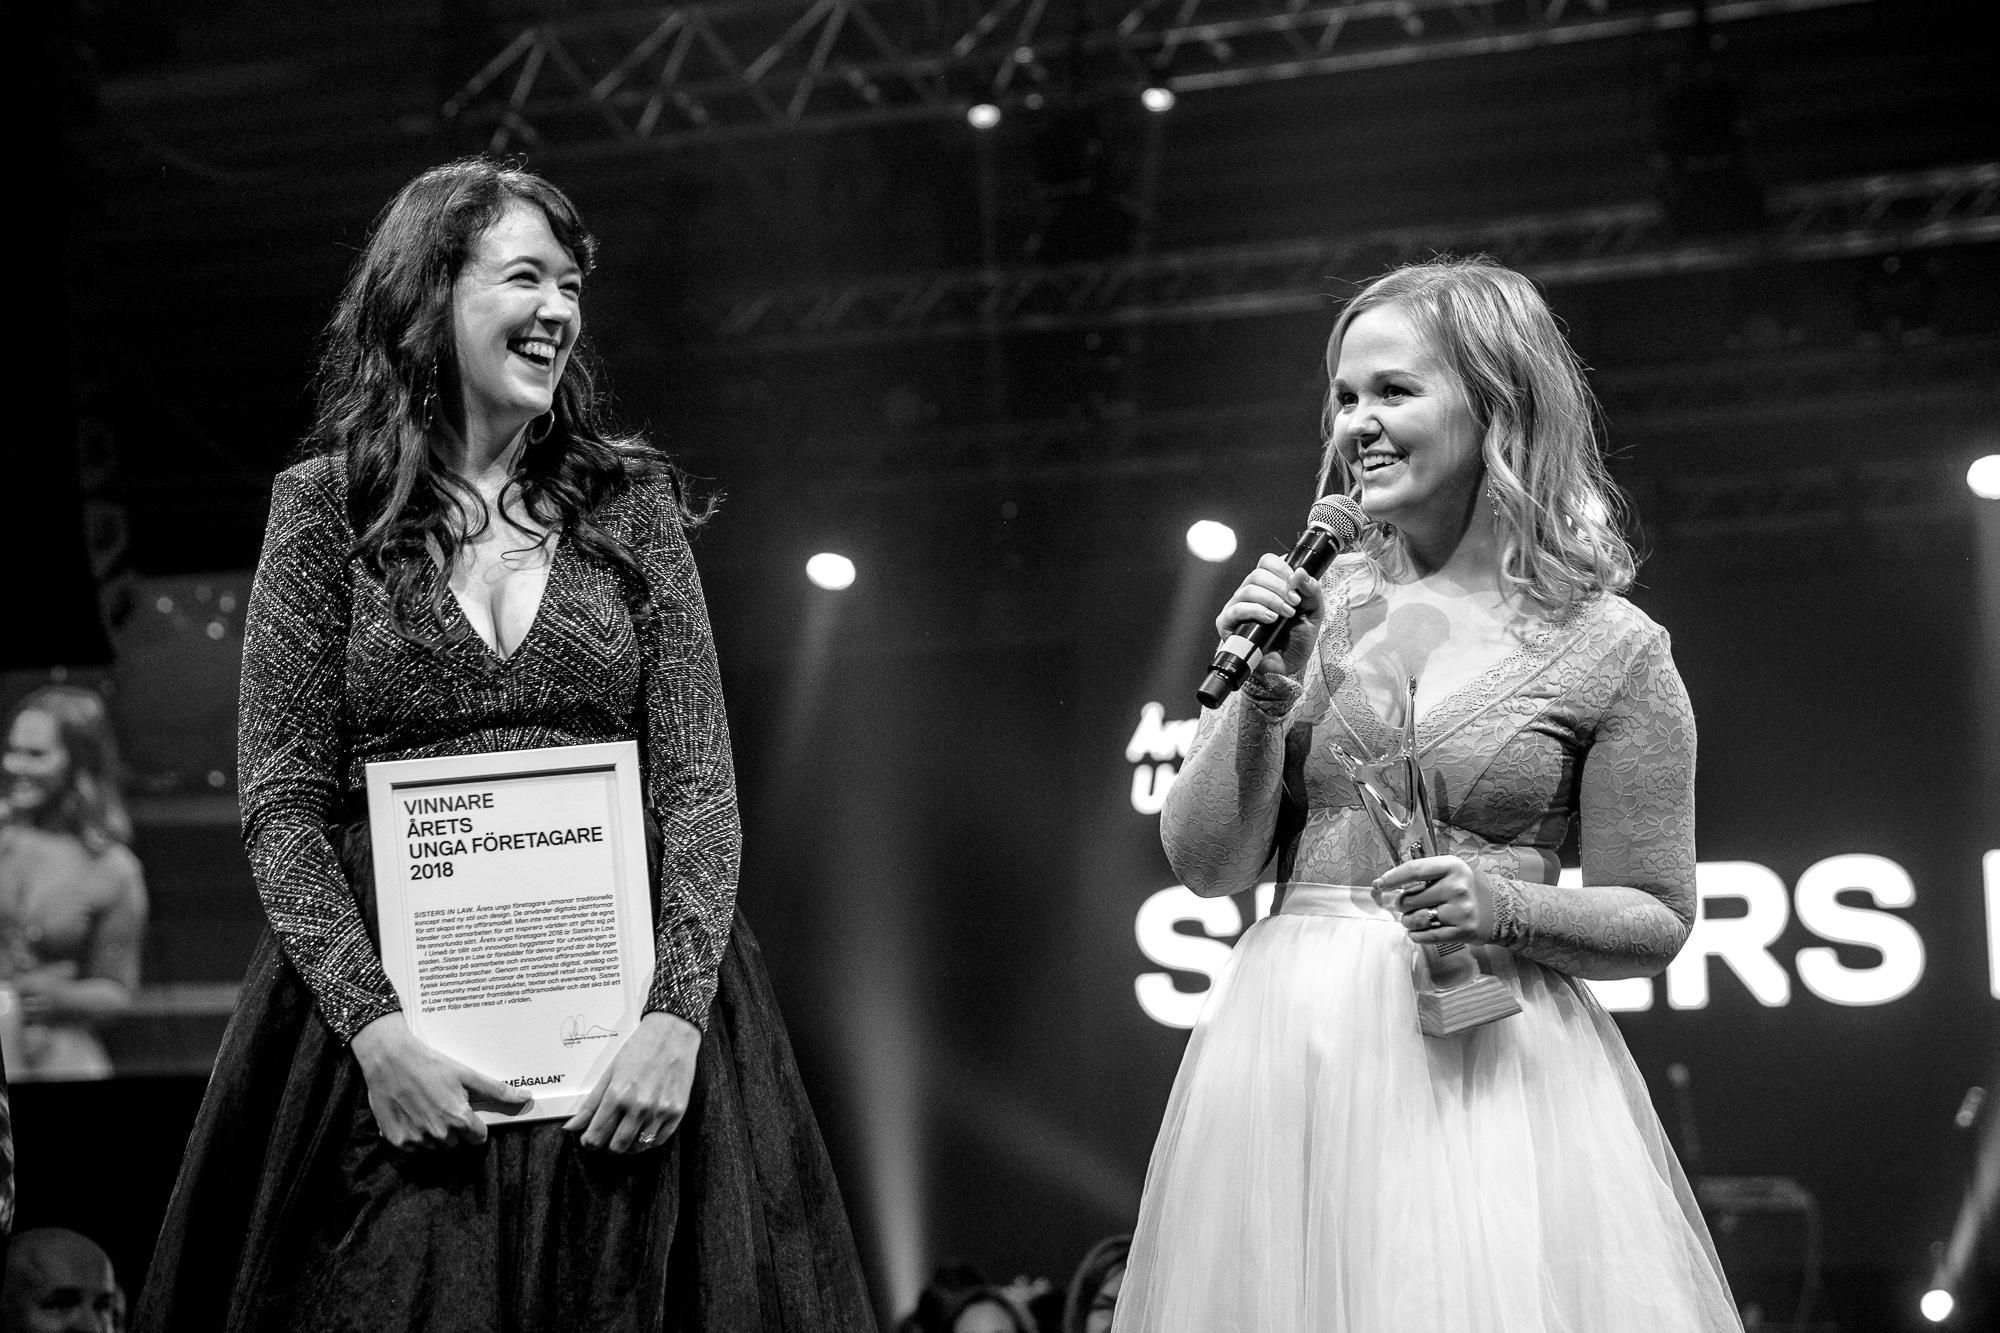 Årets Unga Företagare Sisters in Law